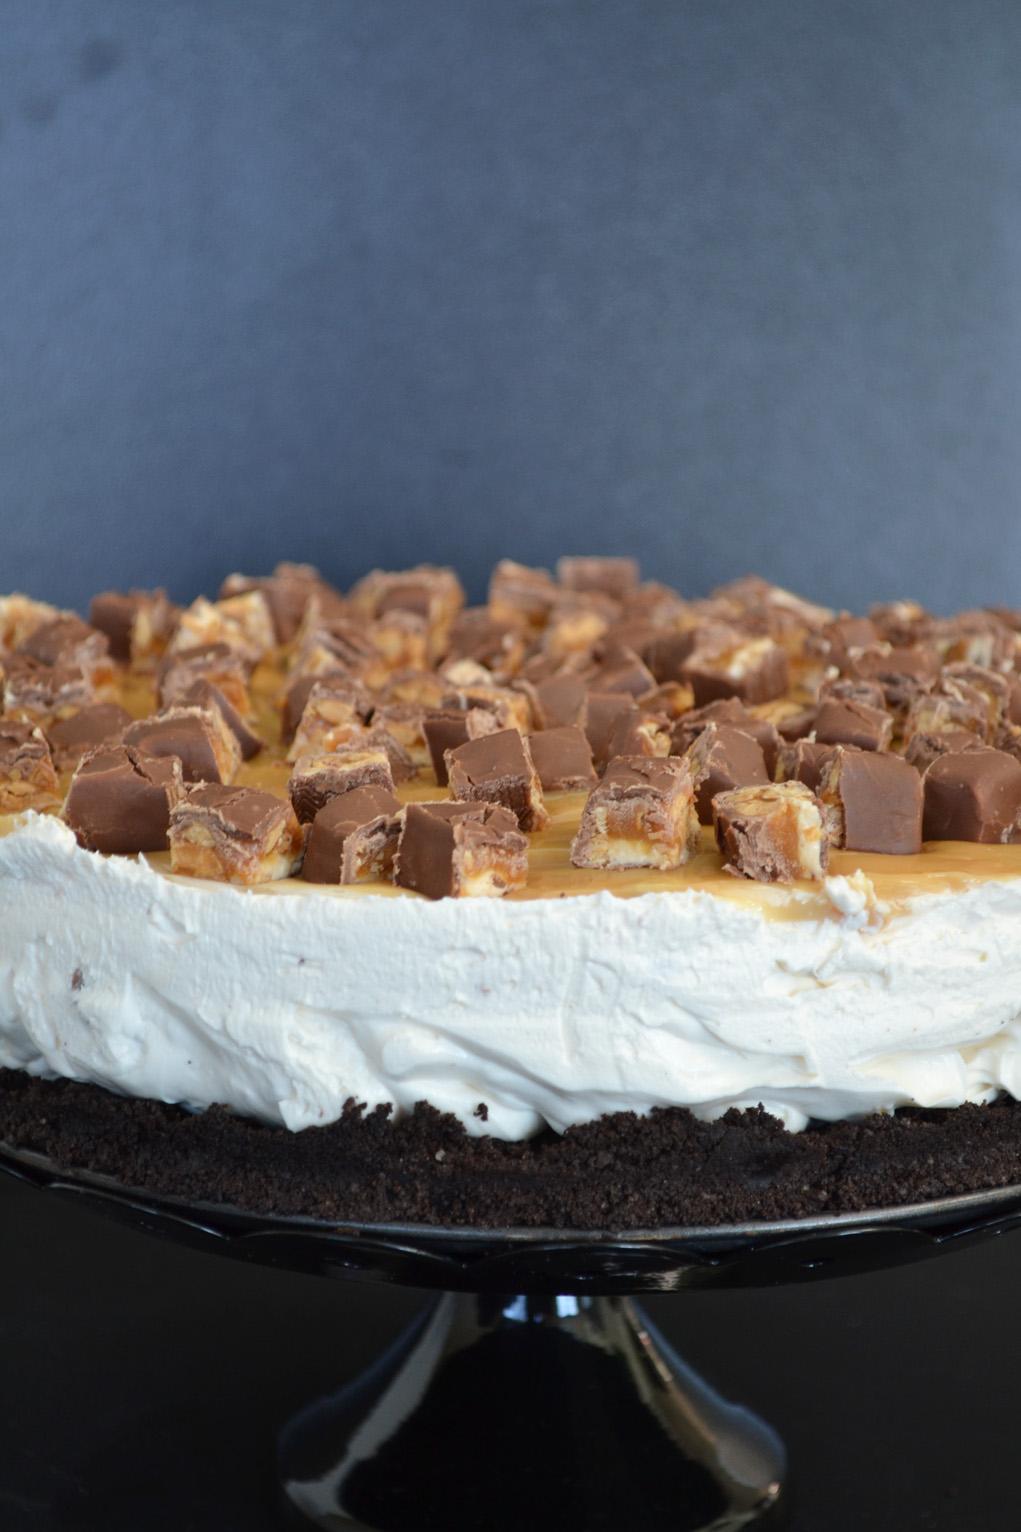 sneackers-cheesecake-dsc_0161